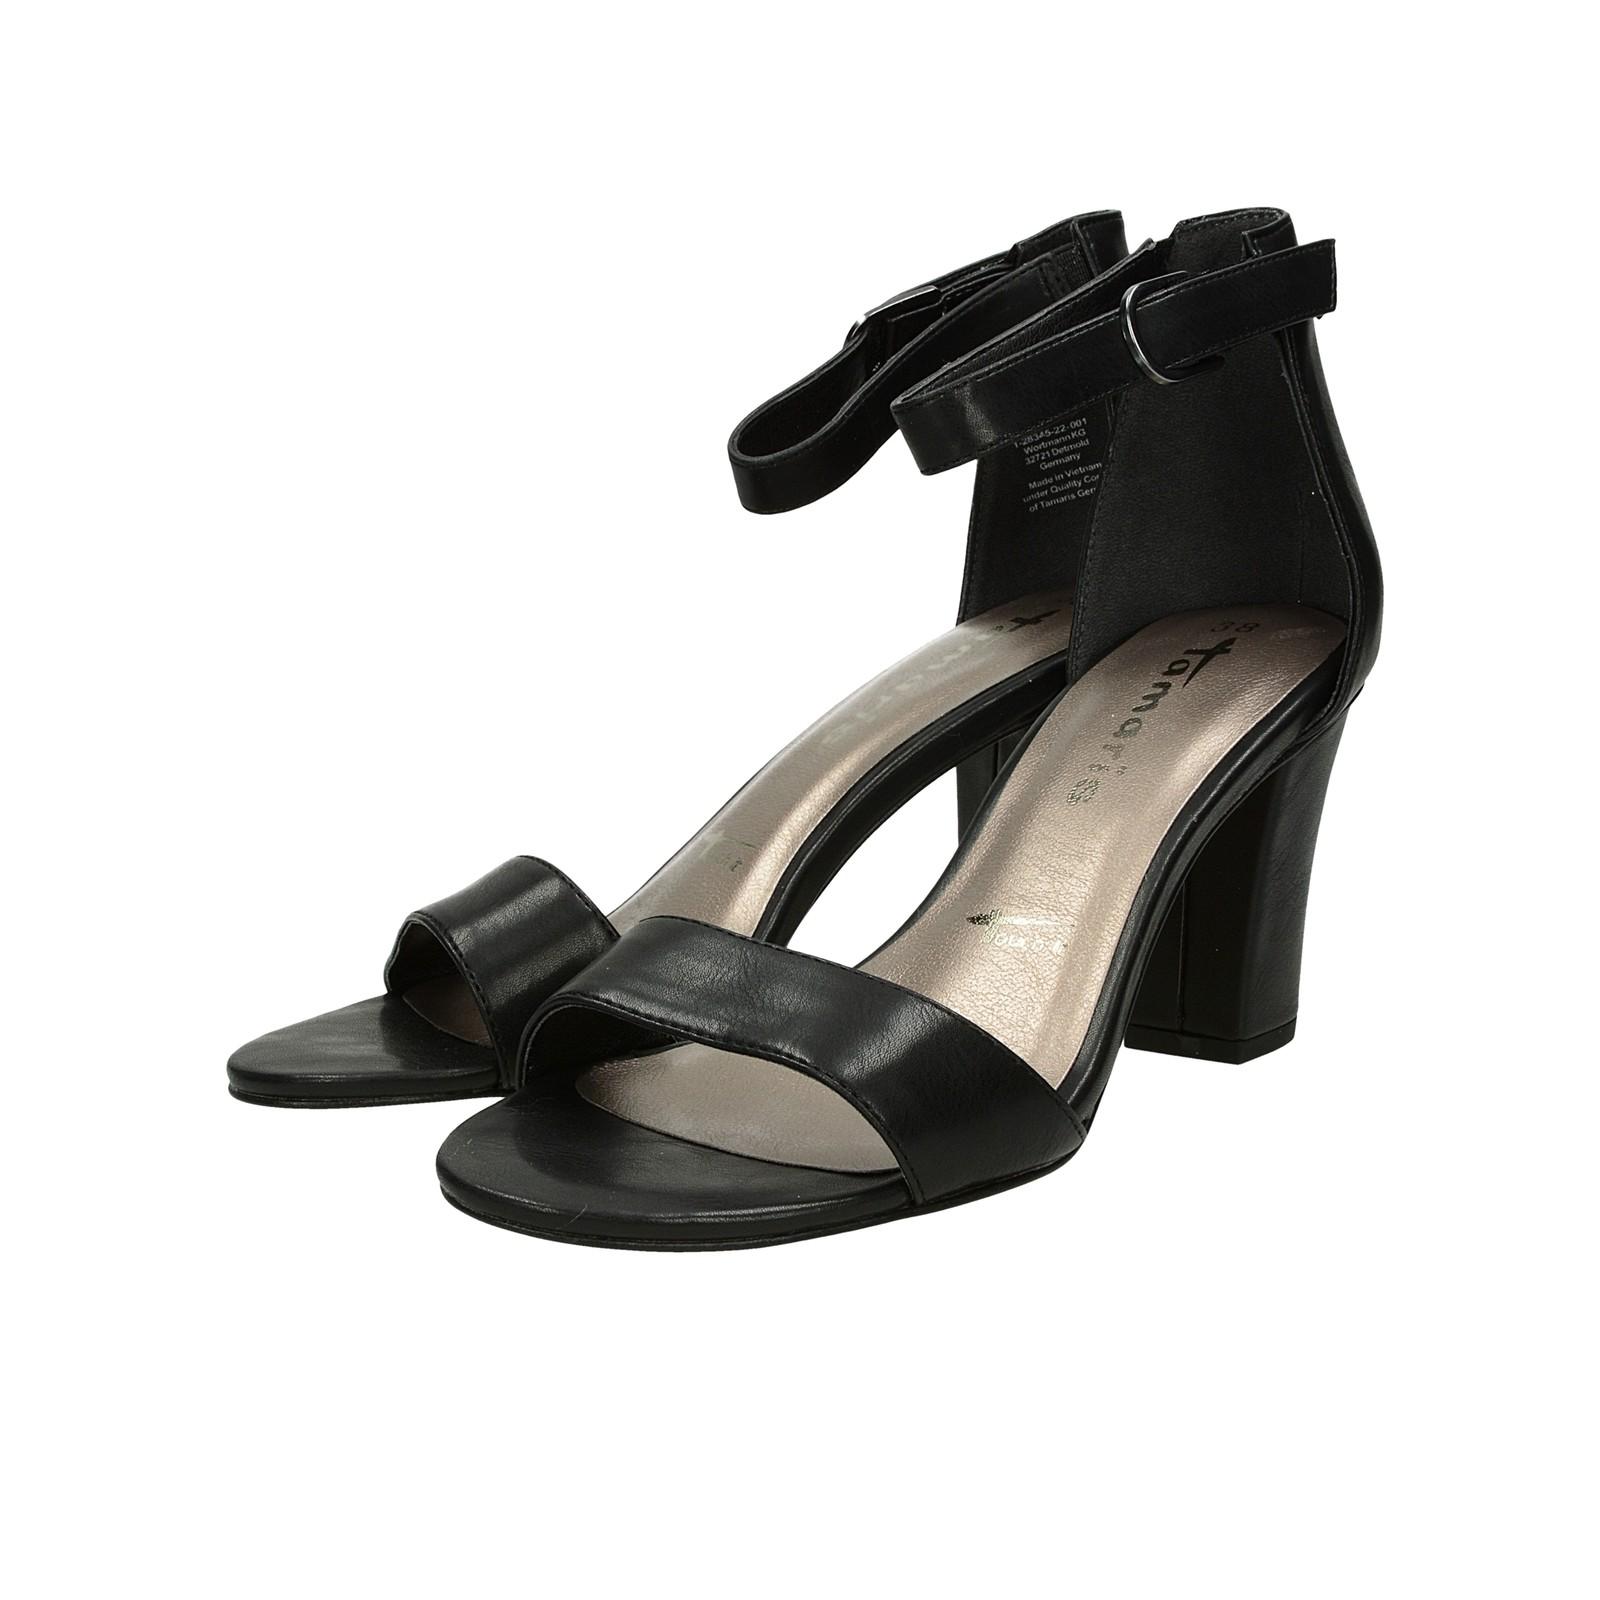 194b32d6ebda Tamaris dámske pohodlné sandále - čierne ...